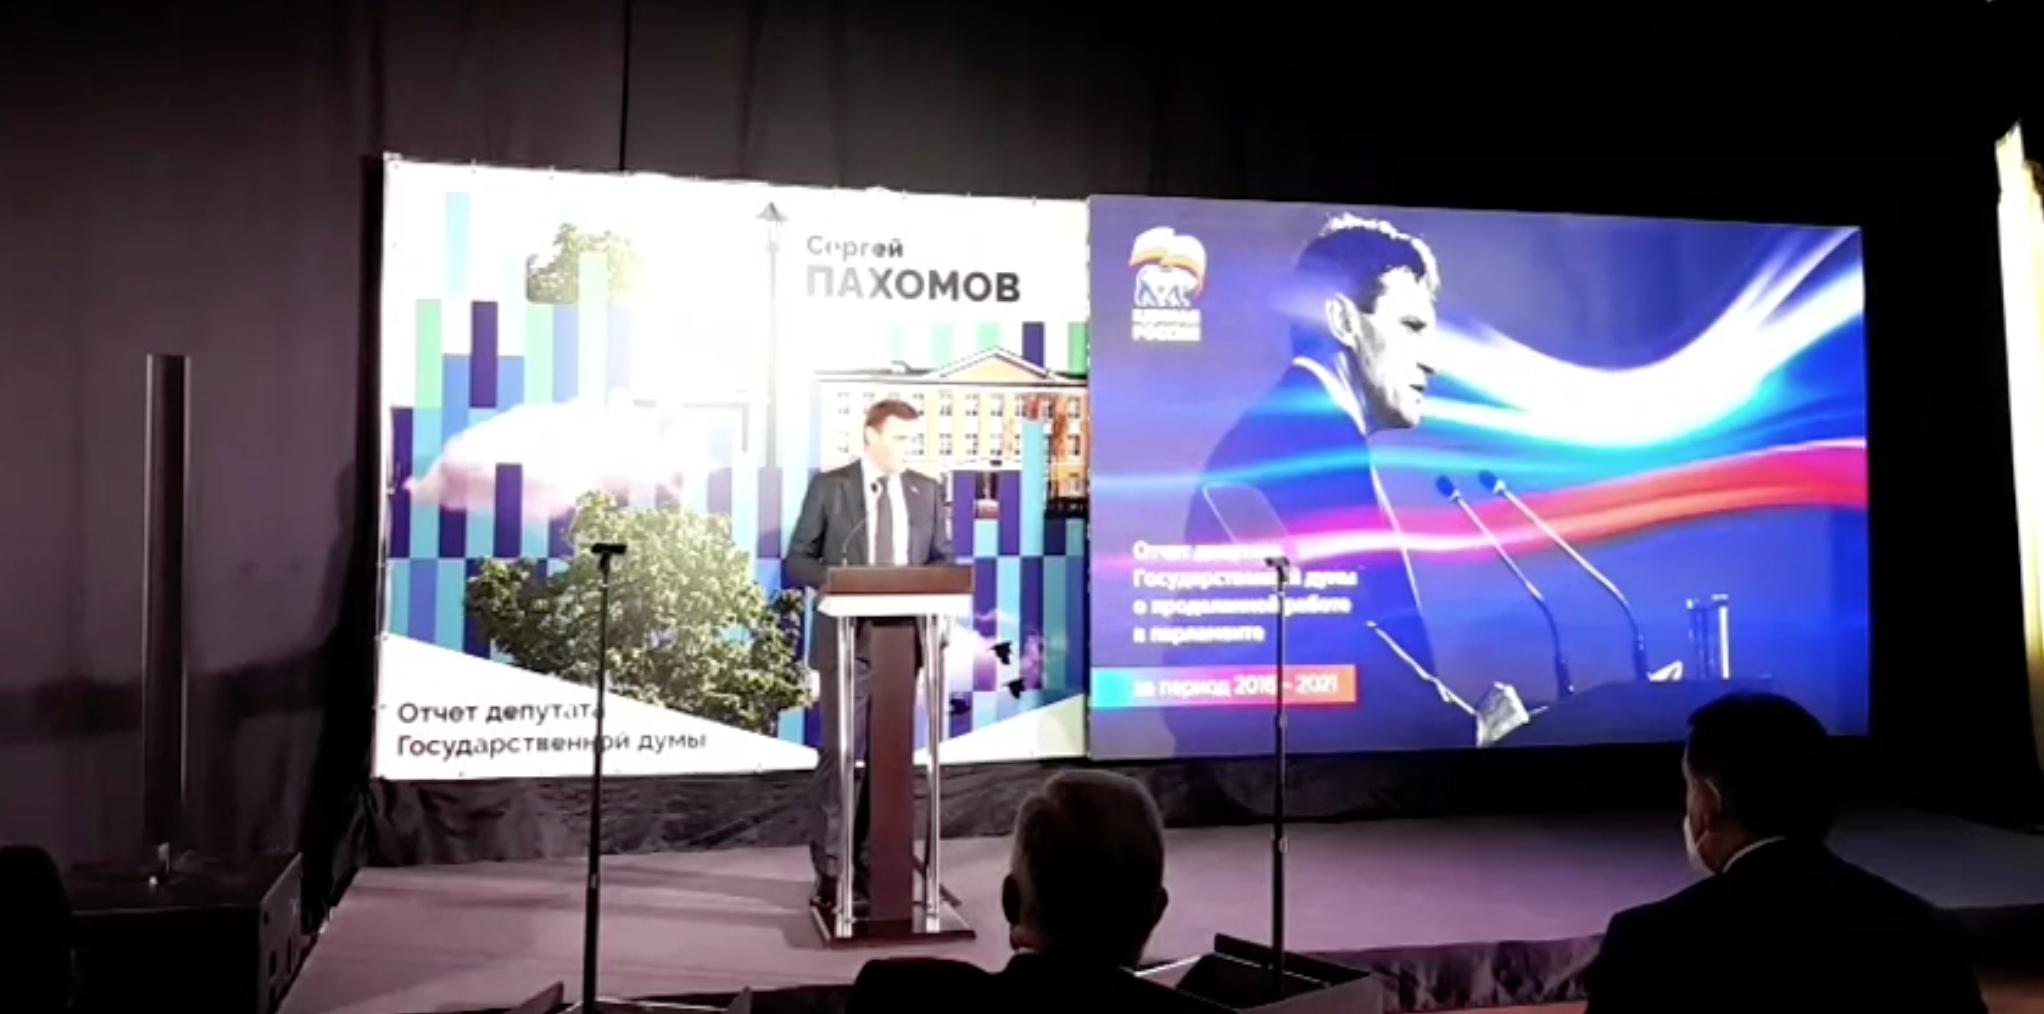 Коллектив управляющей компании «МКД «Восток» смотрел онлайн-трансляцию отчёта депутата Госдумы Сергея Пахомова